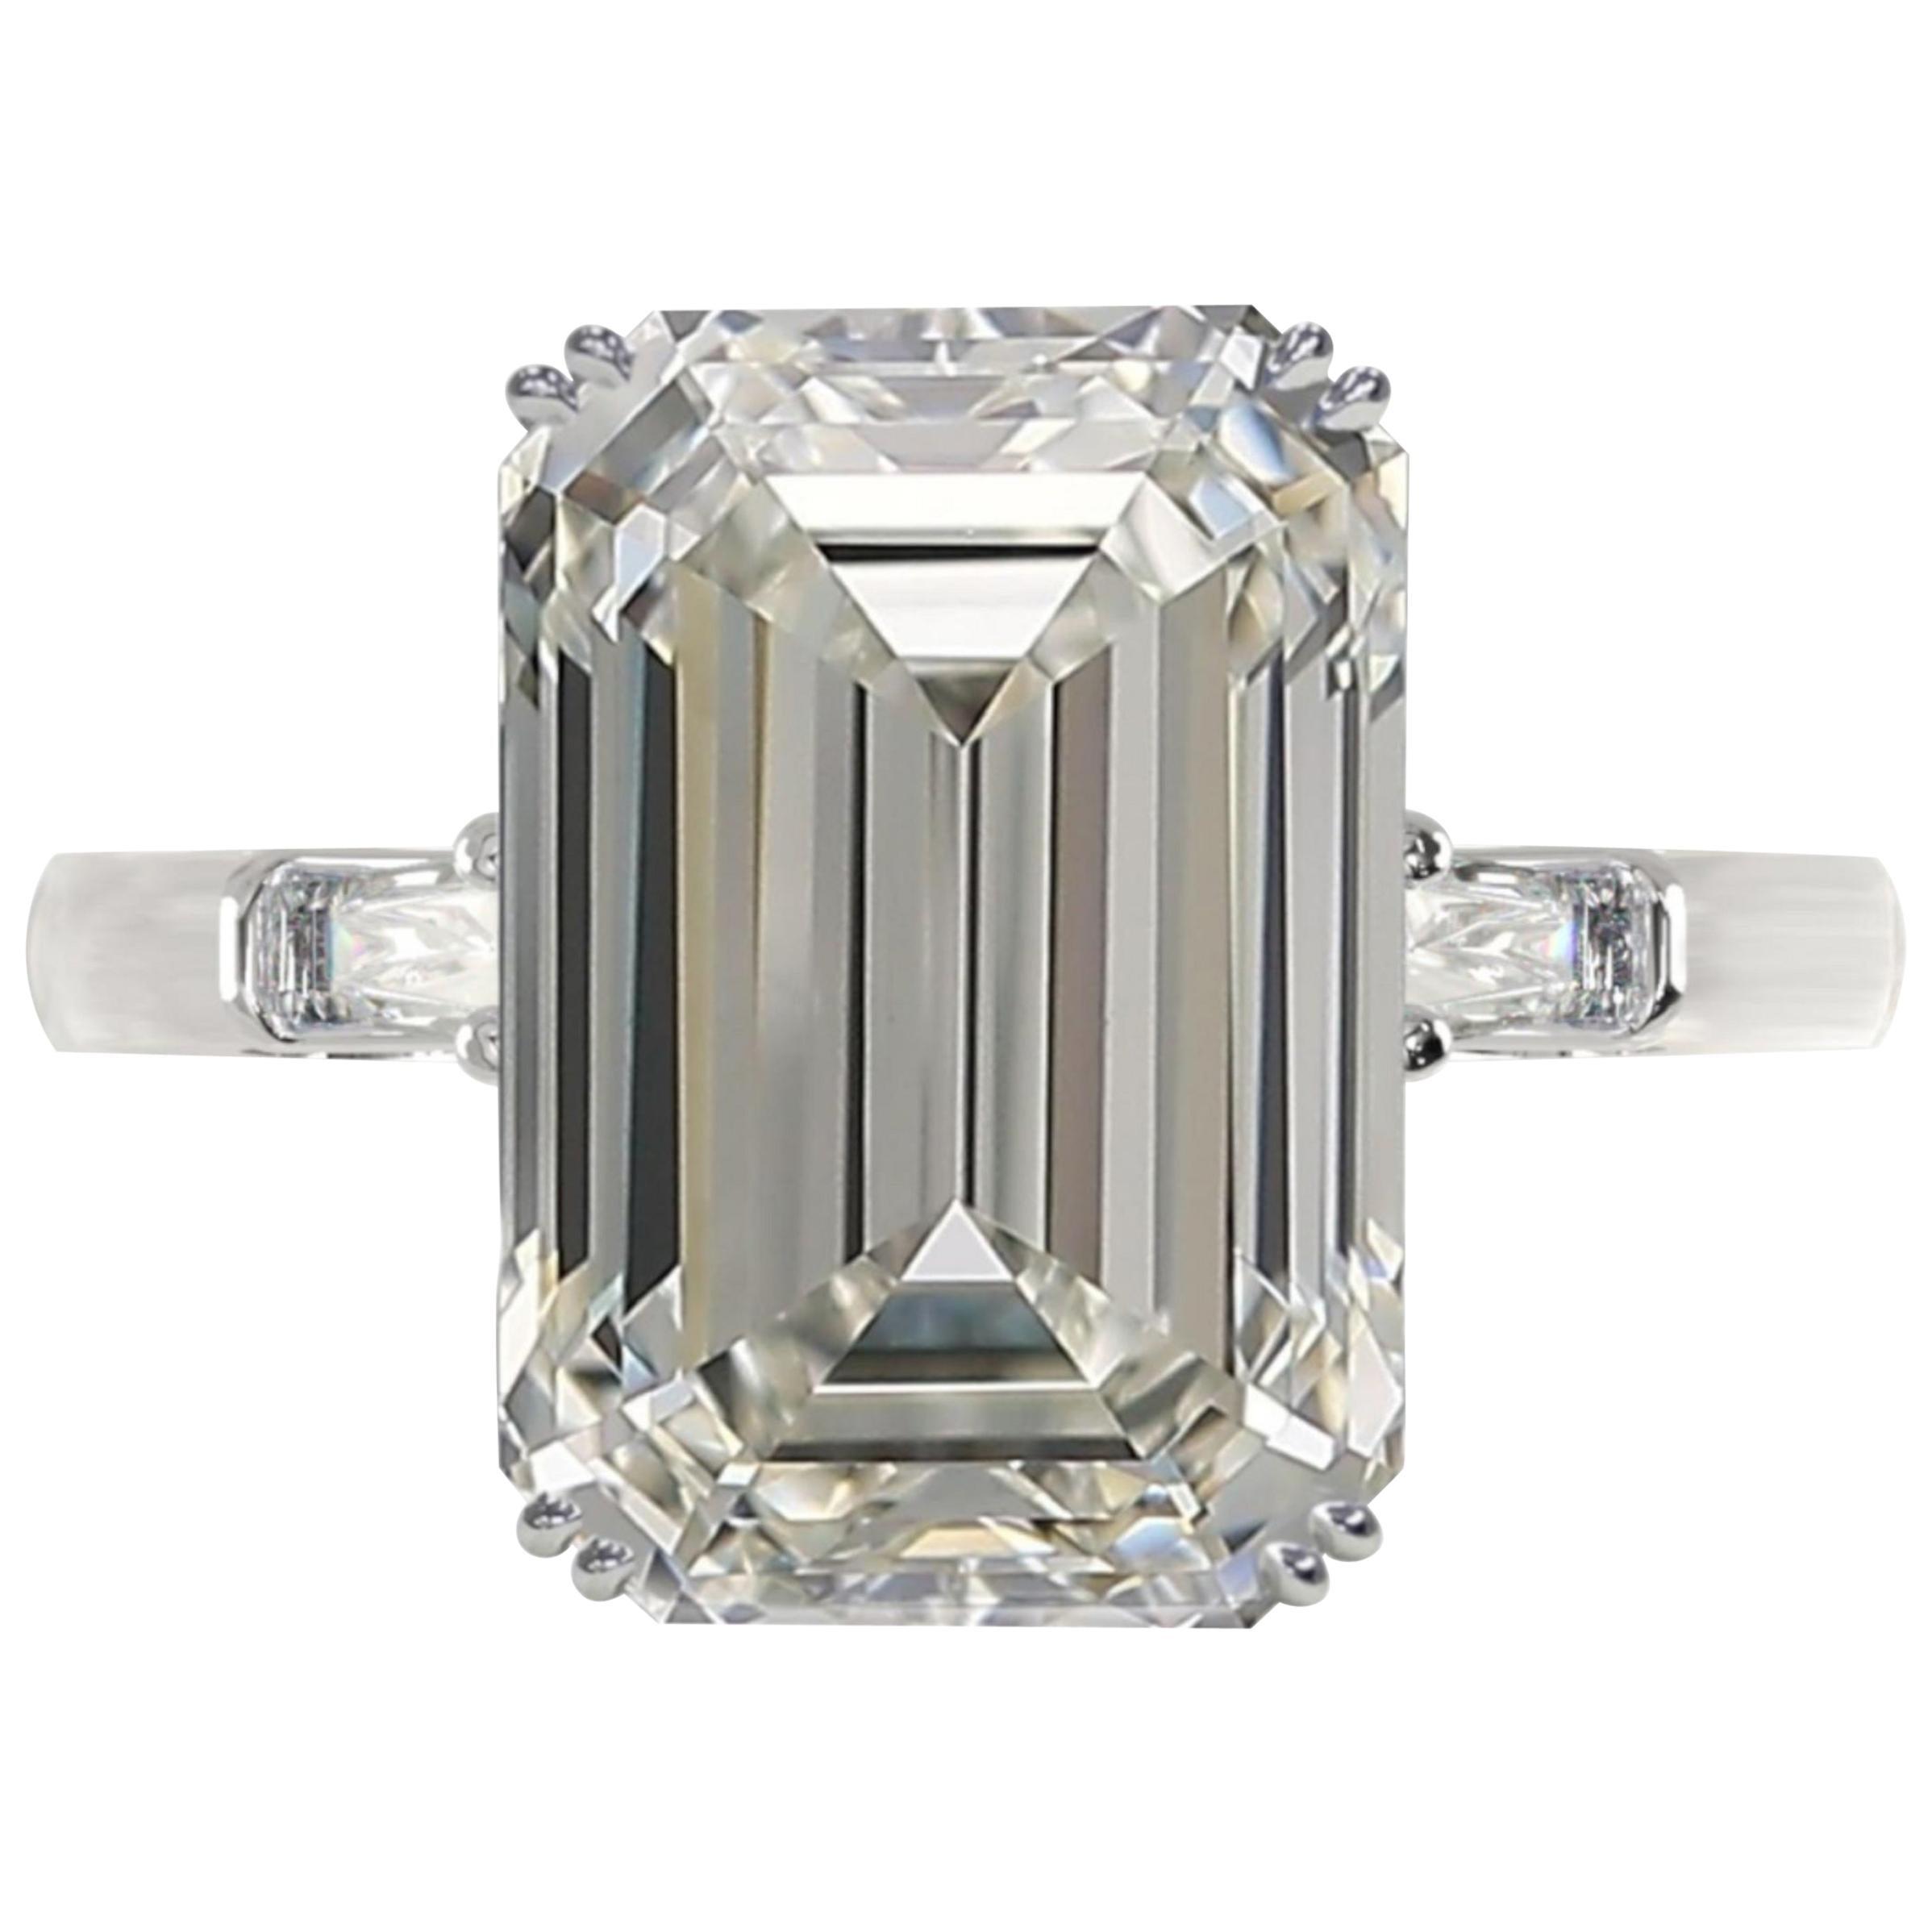 GIA Certified 4.70 Carat Emerald Cut Diamond Ring Long Ratio 1.57